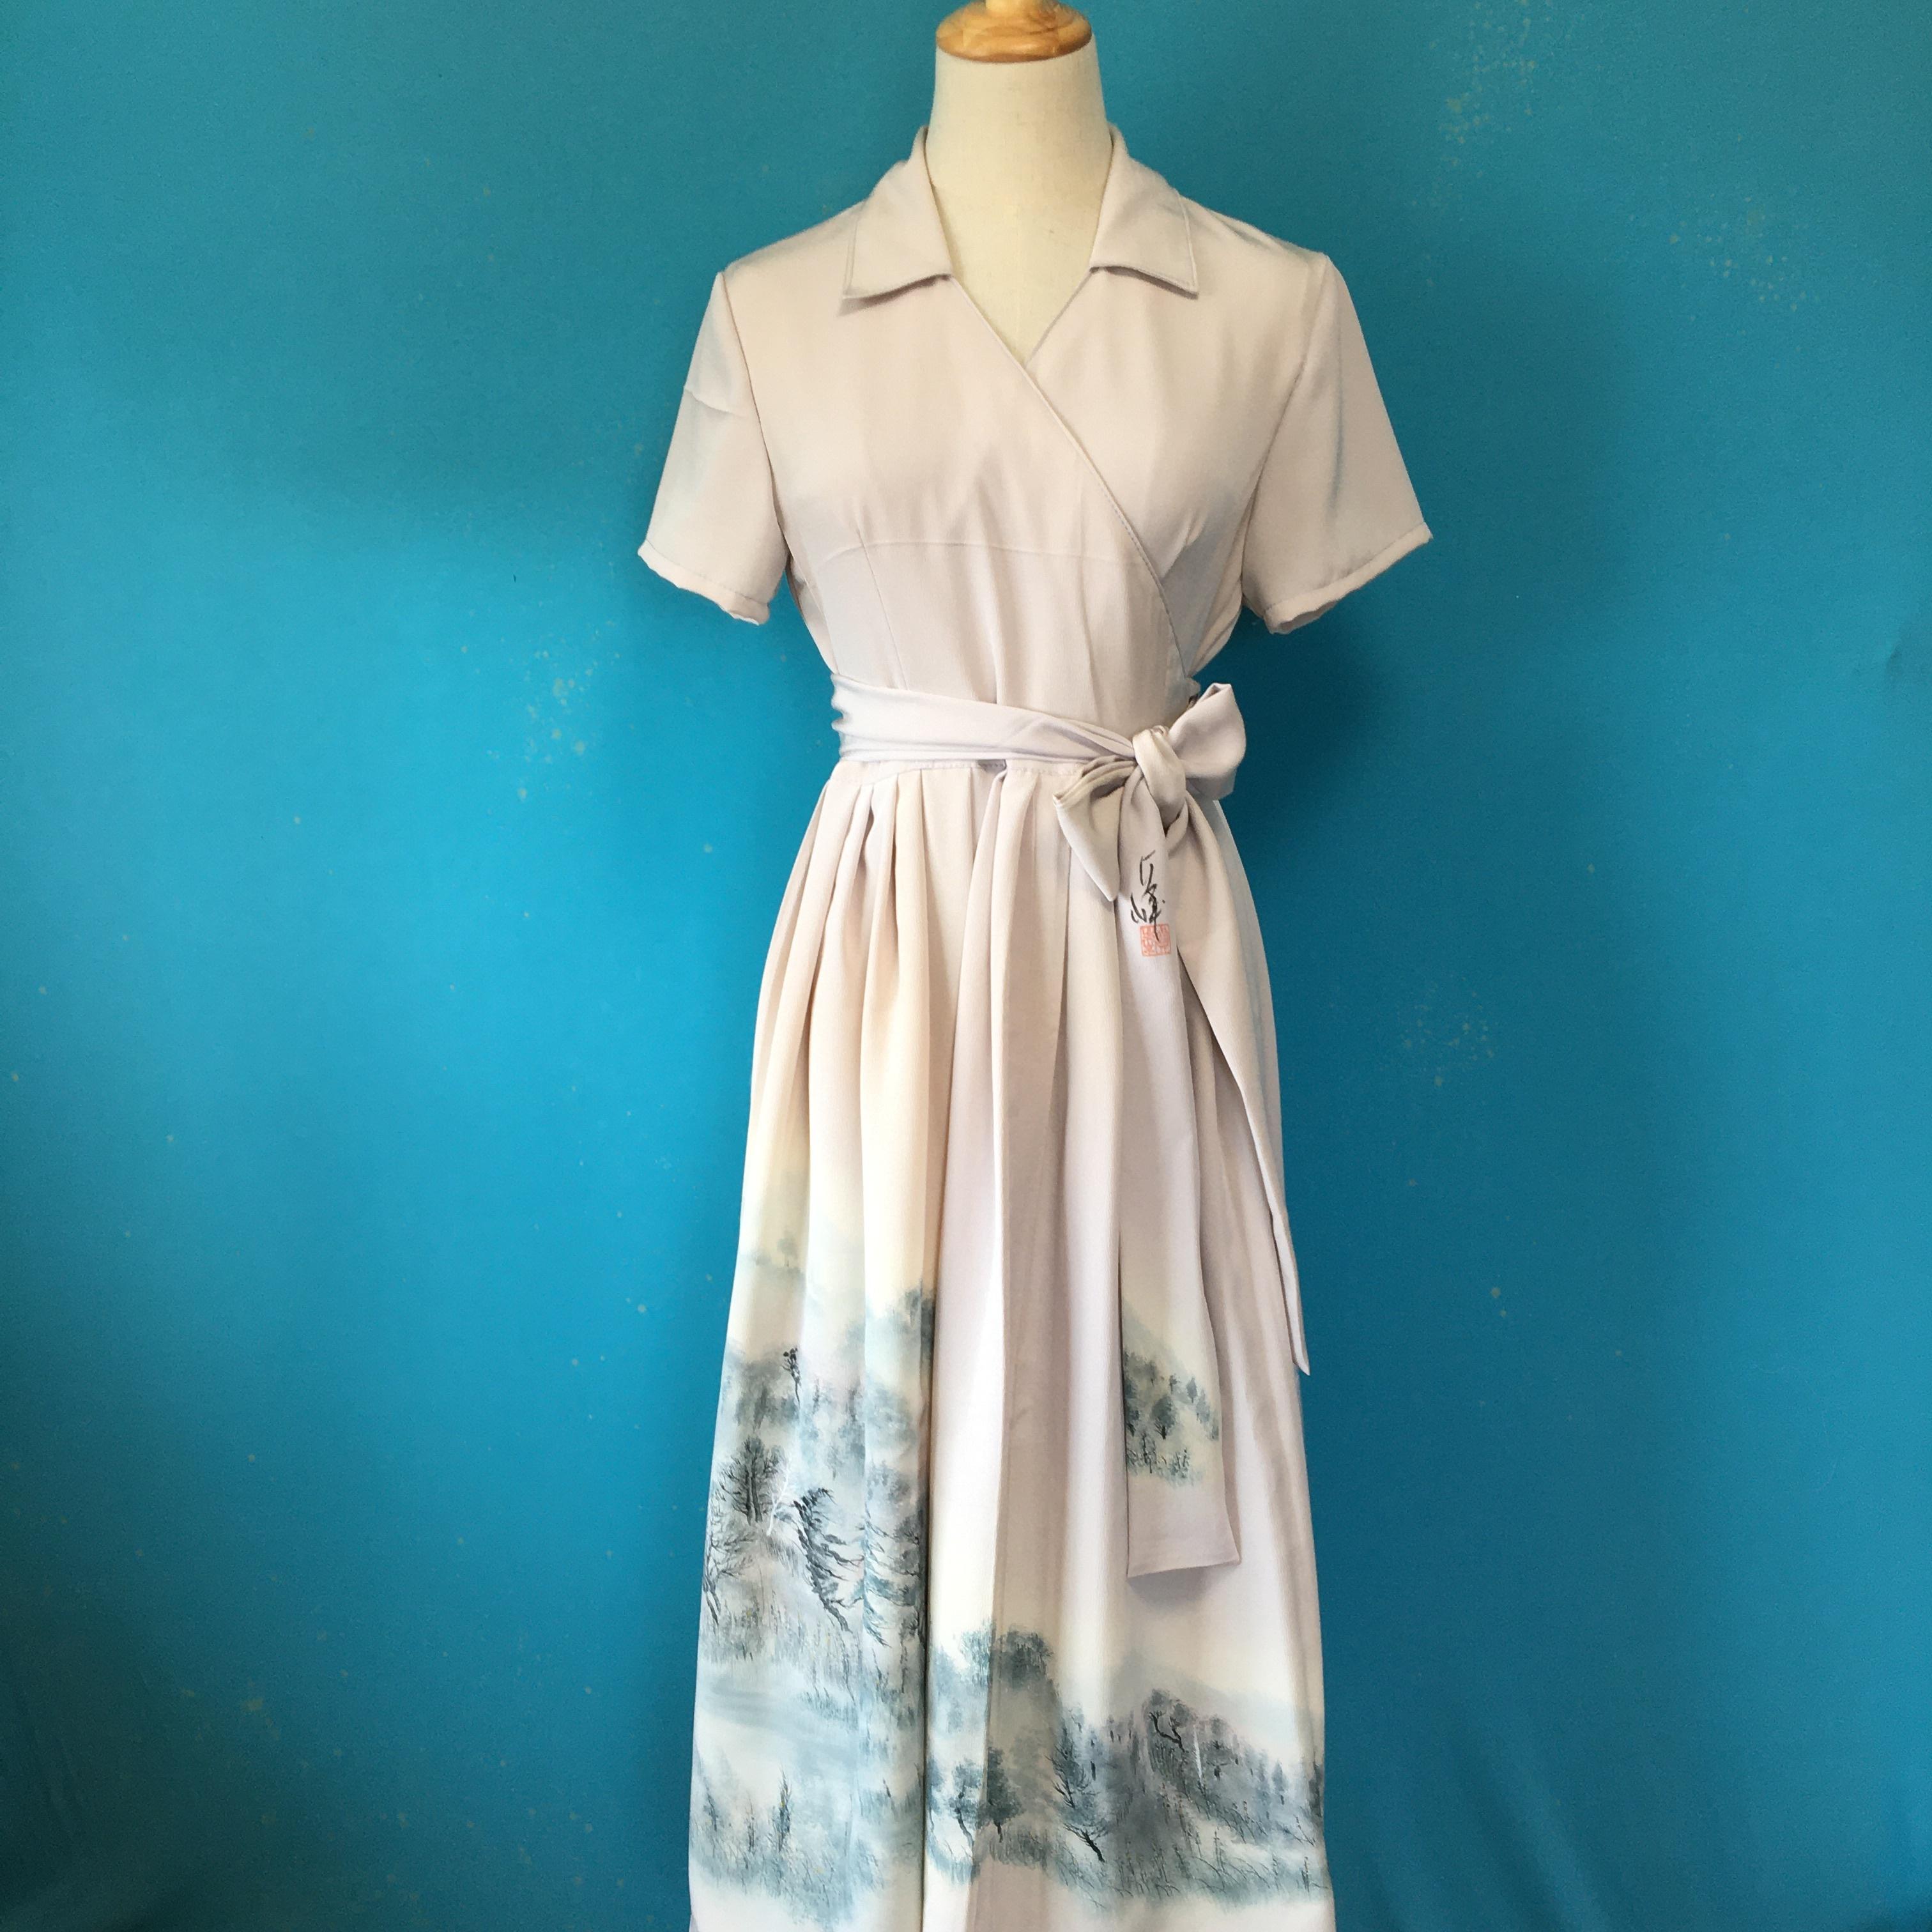 Vintage kimono dress/ US 8 落款